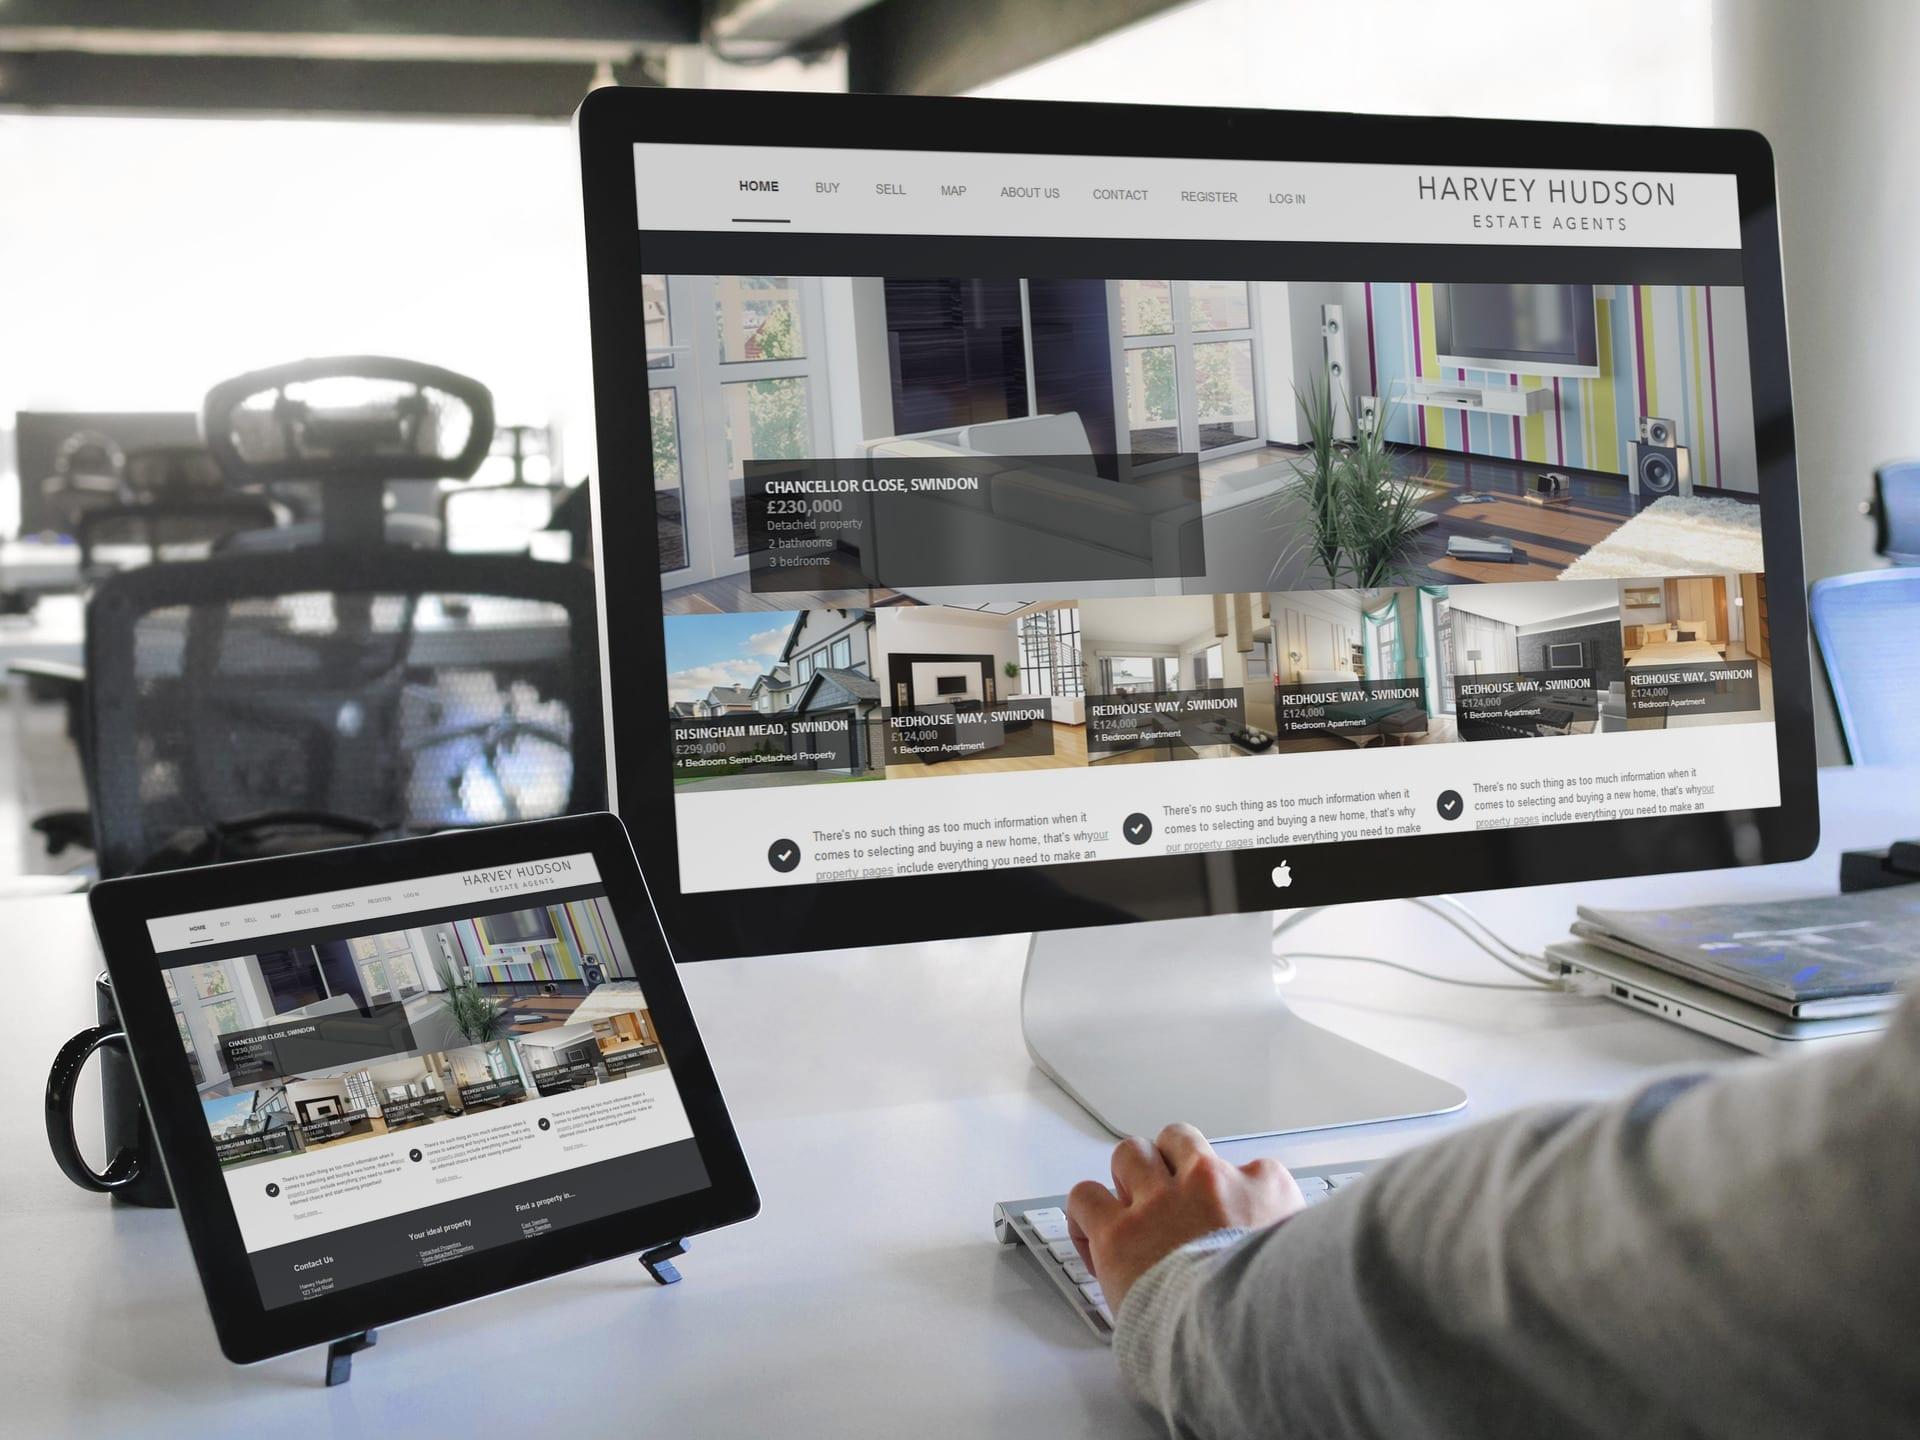 new-website-launched-for-estate-agents-harvey-hudson.jpg